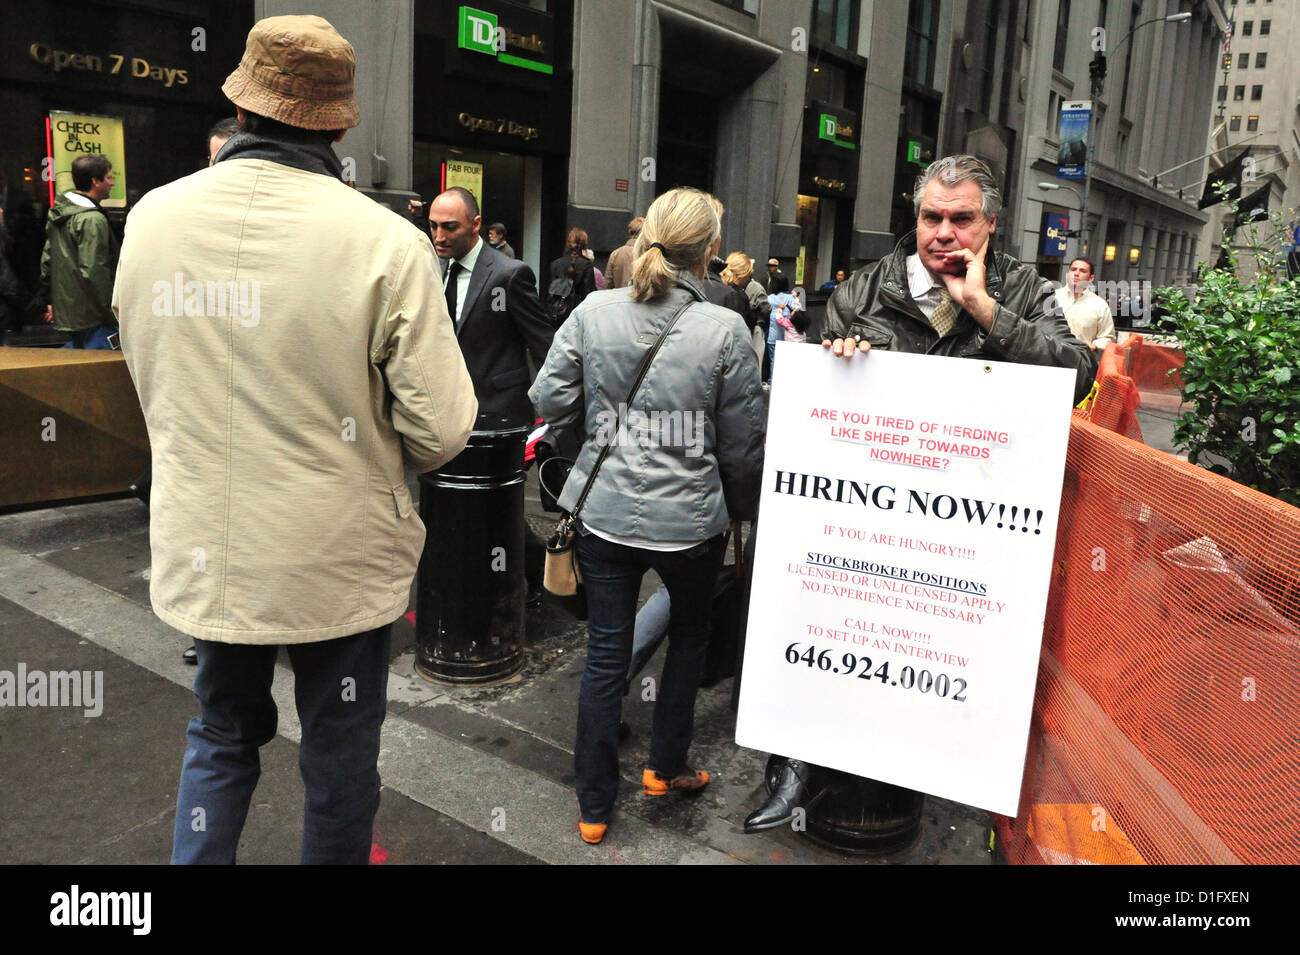 Protestation américaine sans emploi à Wall Street à Manhattan, New York. Photo Stock